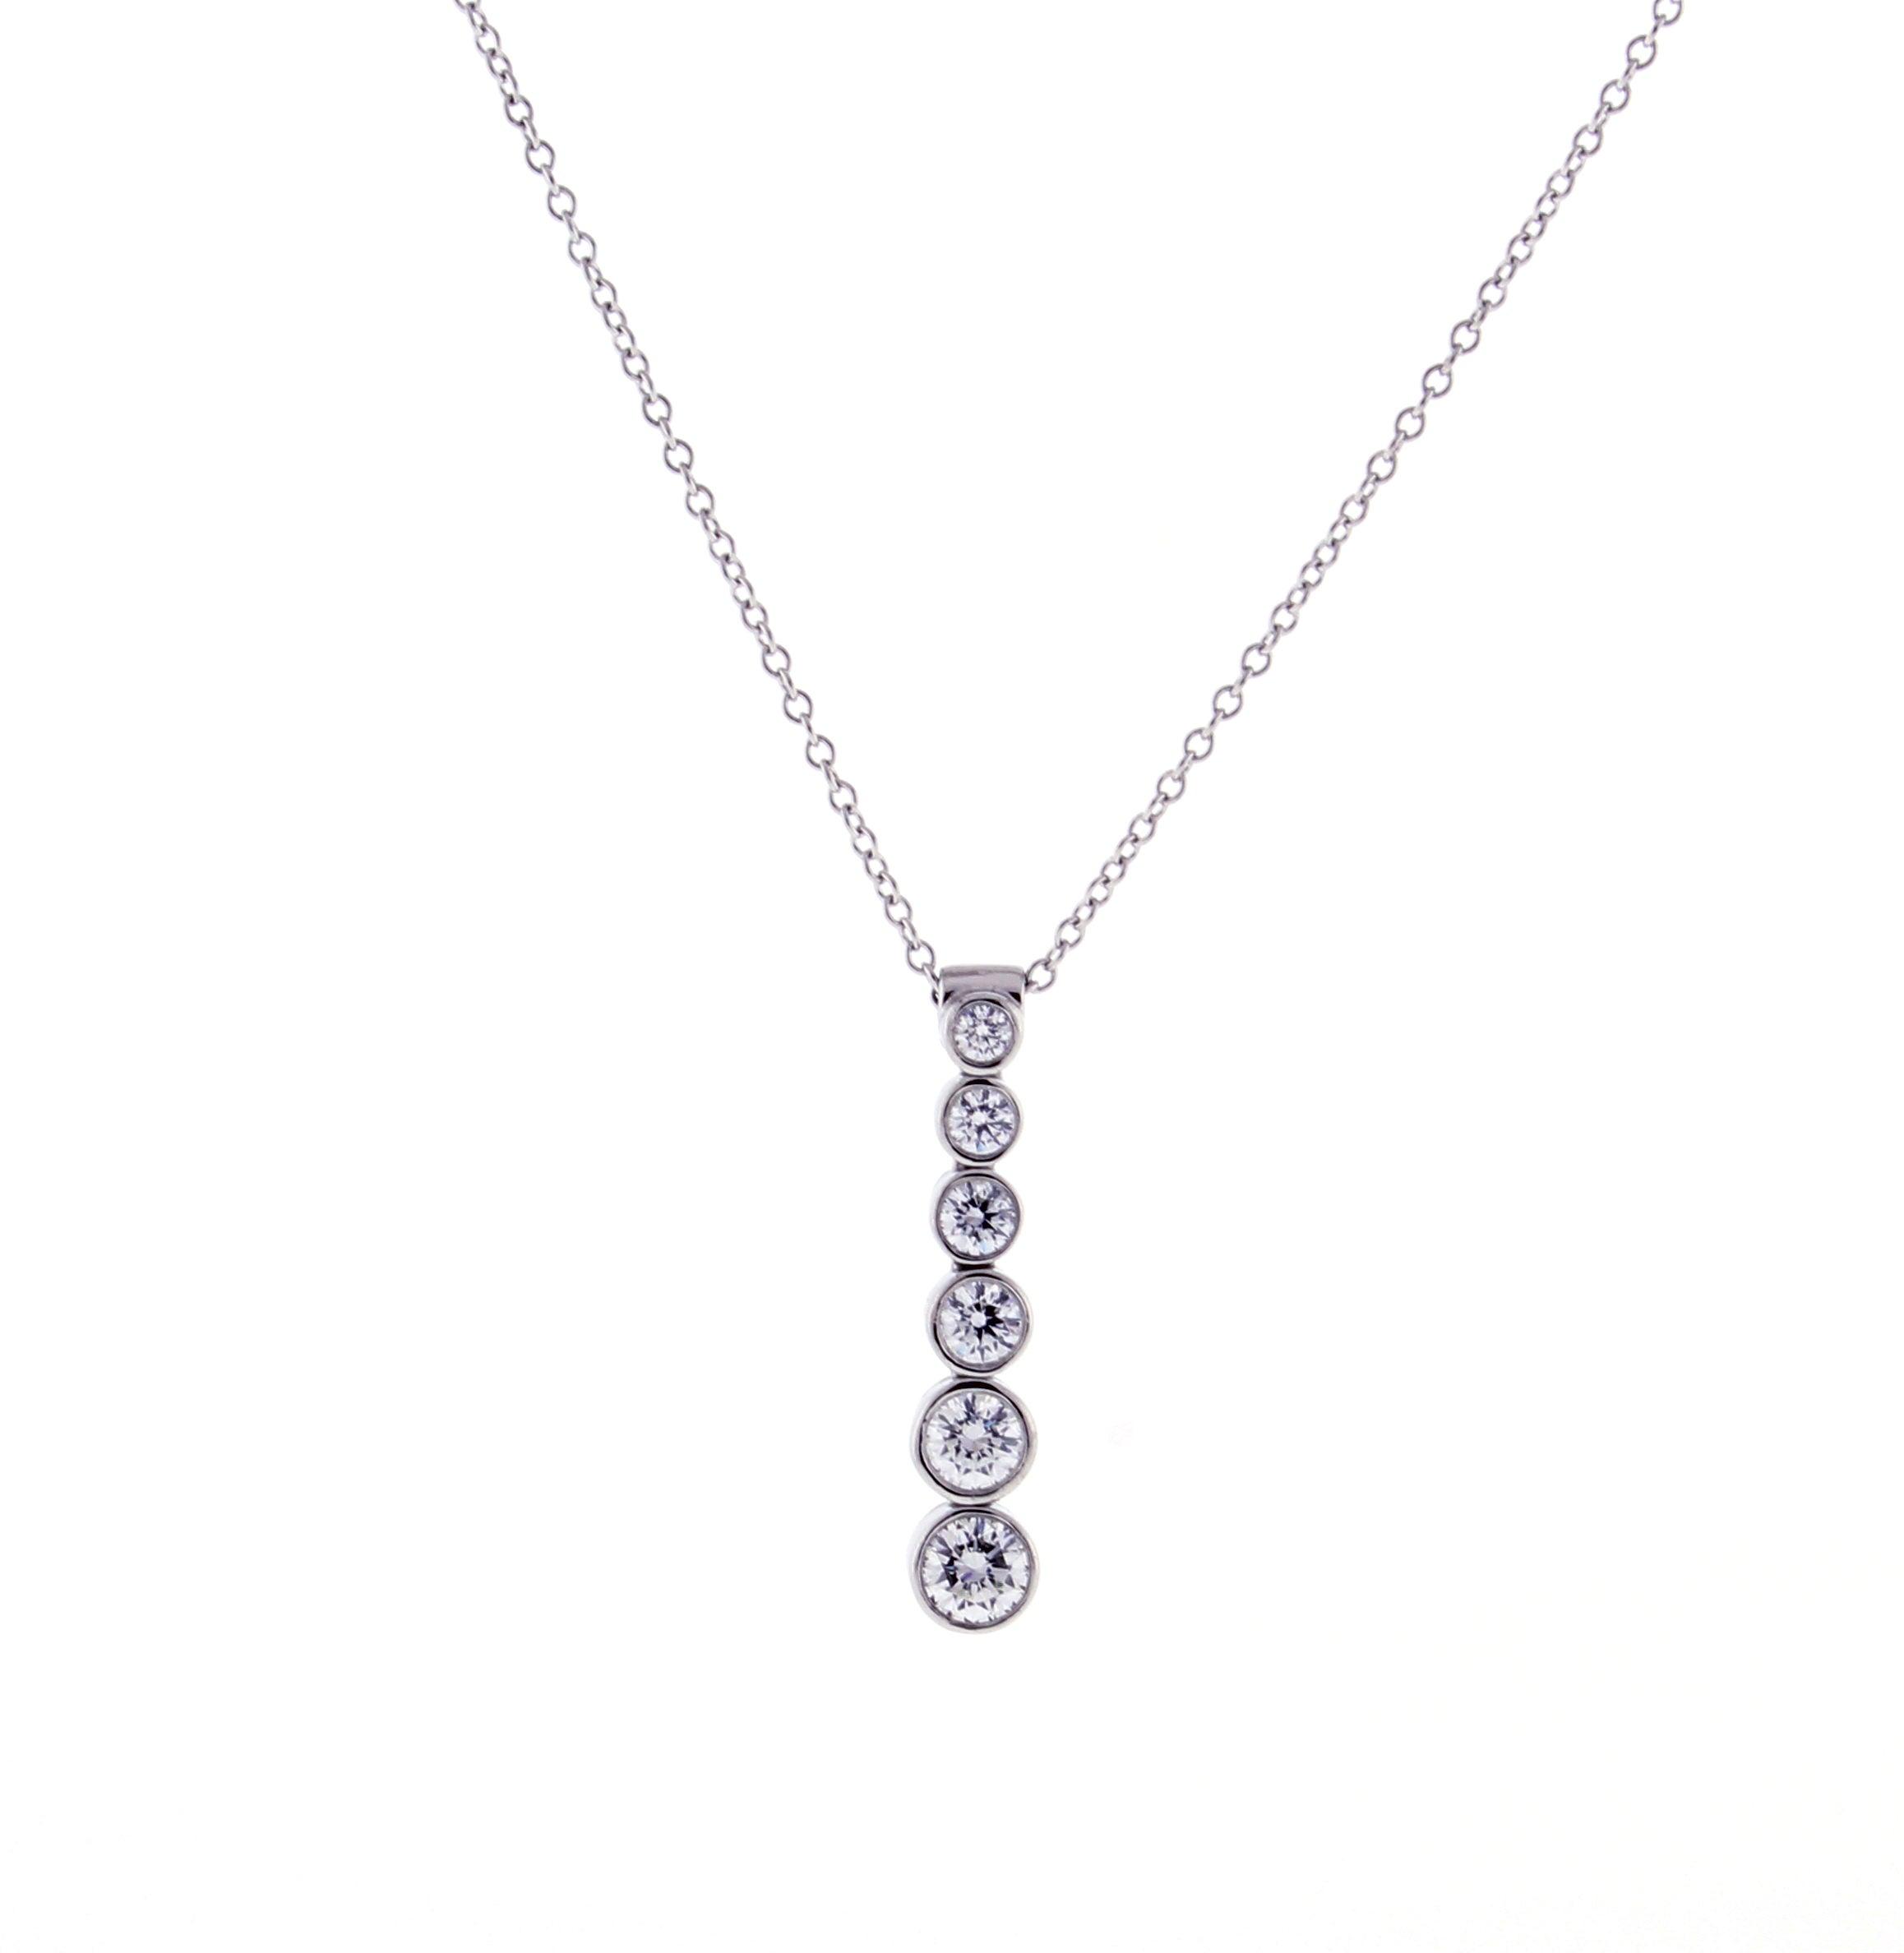 Tiffany & Co. Graduated Drop Pendant